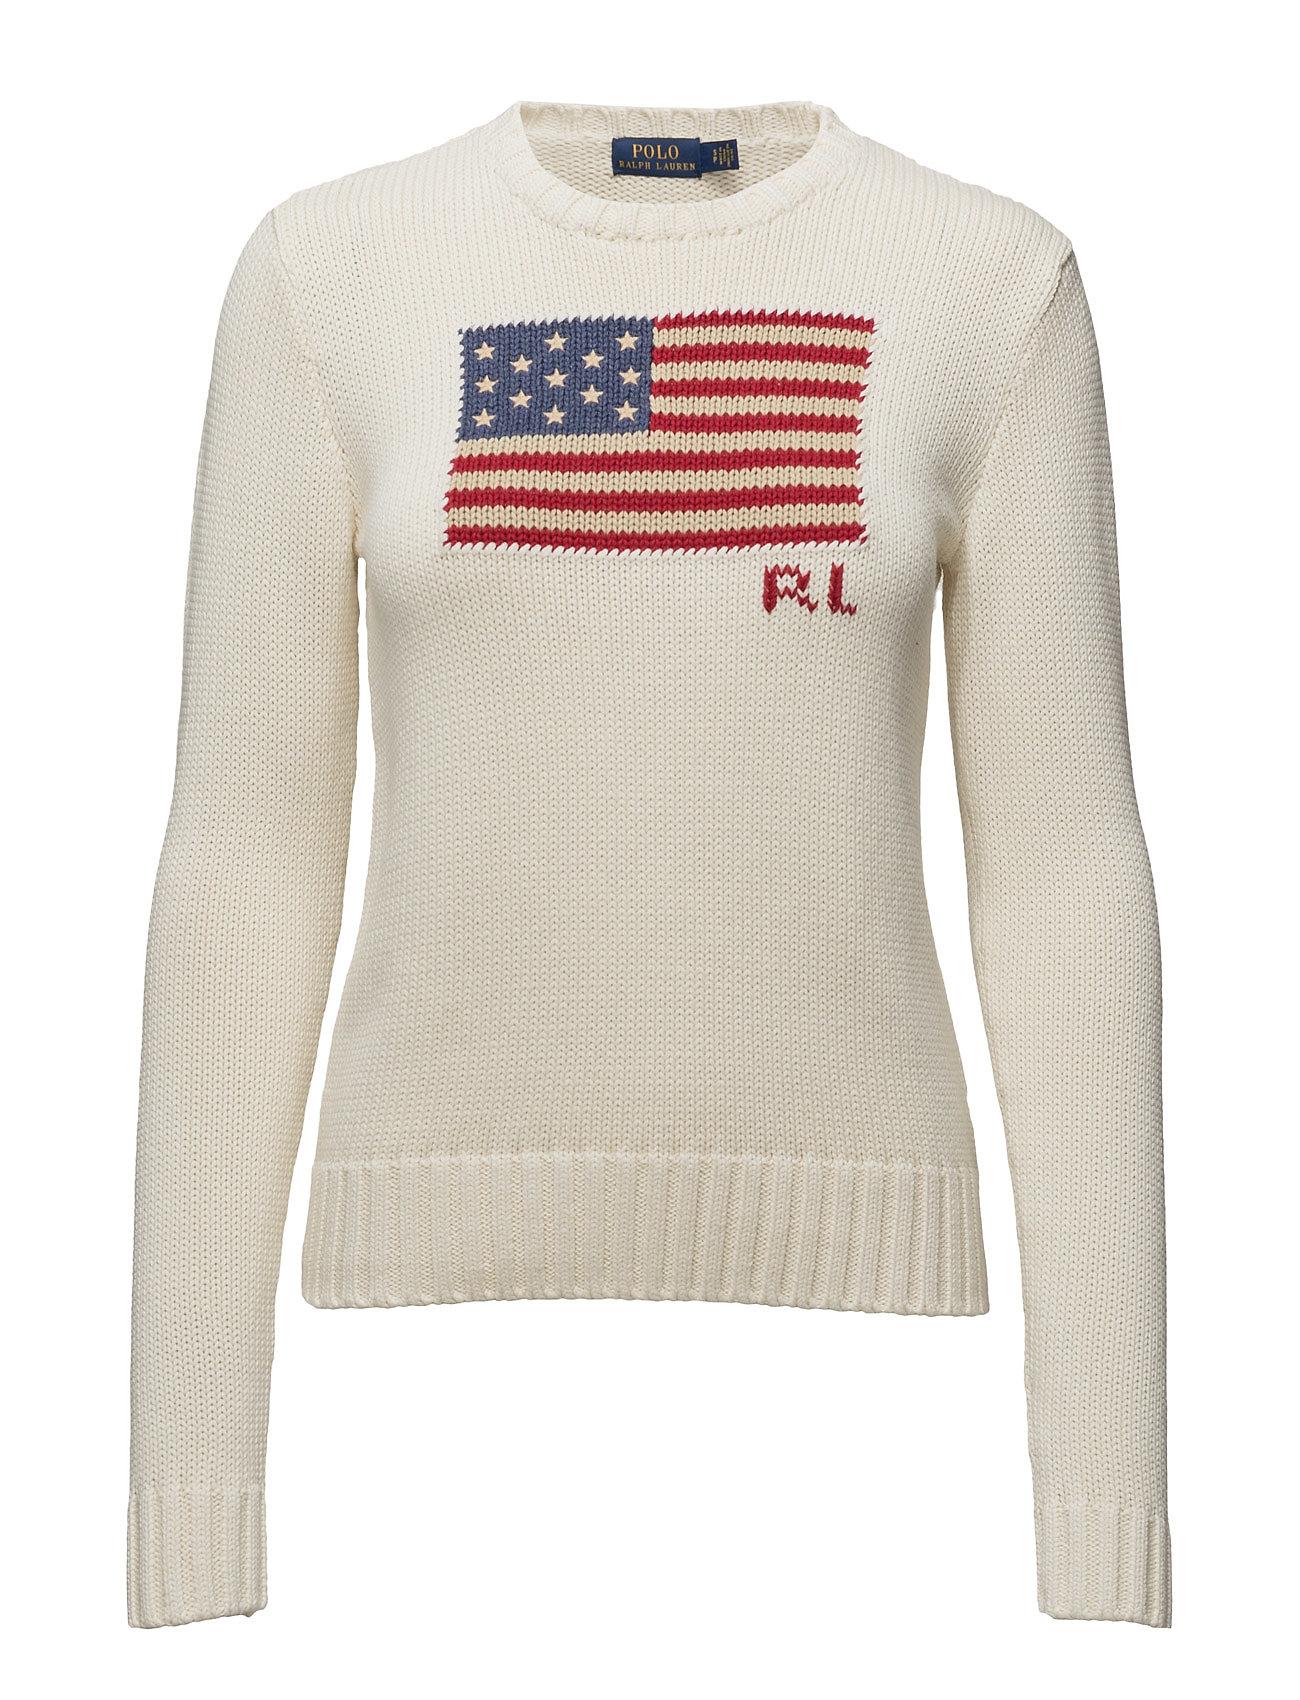 482e29342cd3 Flag Cotton Crewneck Sweater (Cream Multi) (£129) - Polo Ralph ...